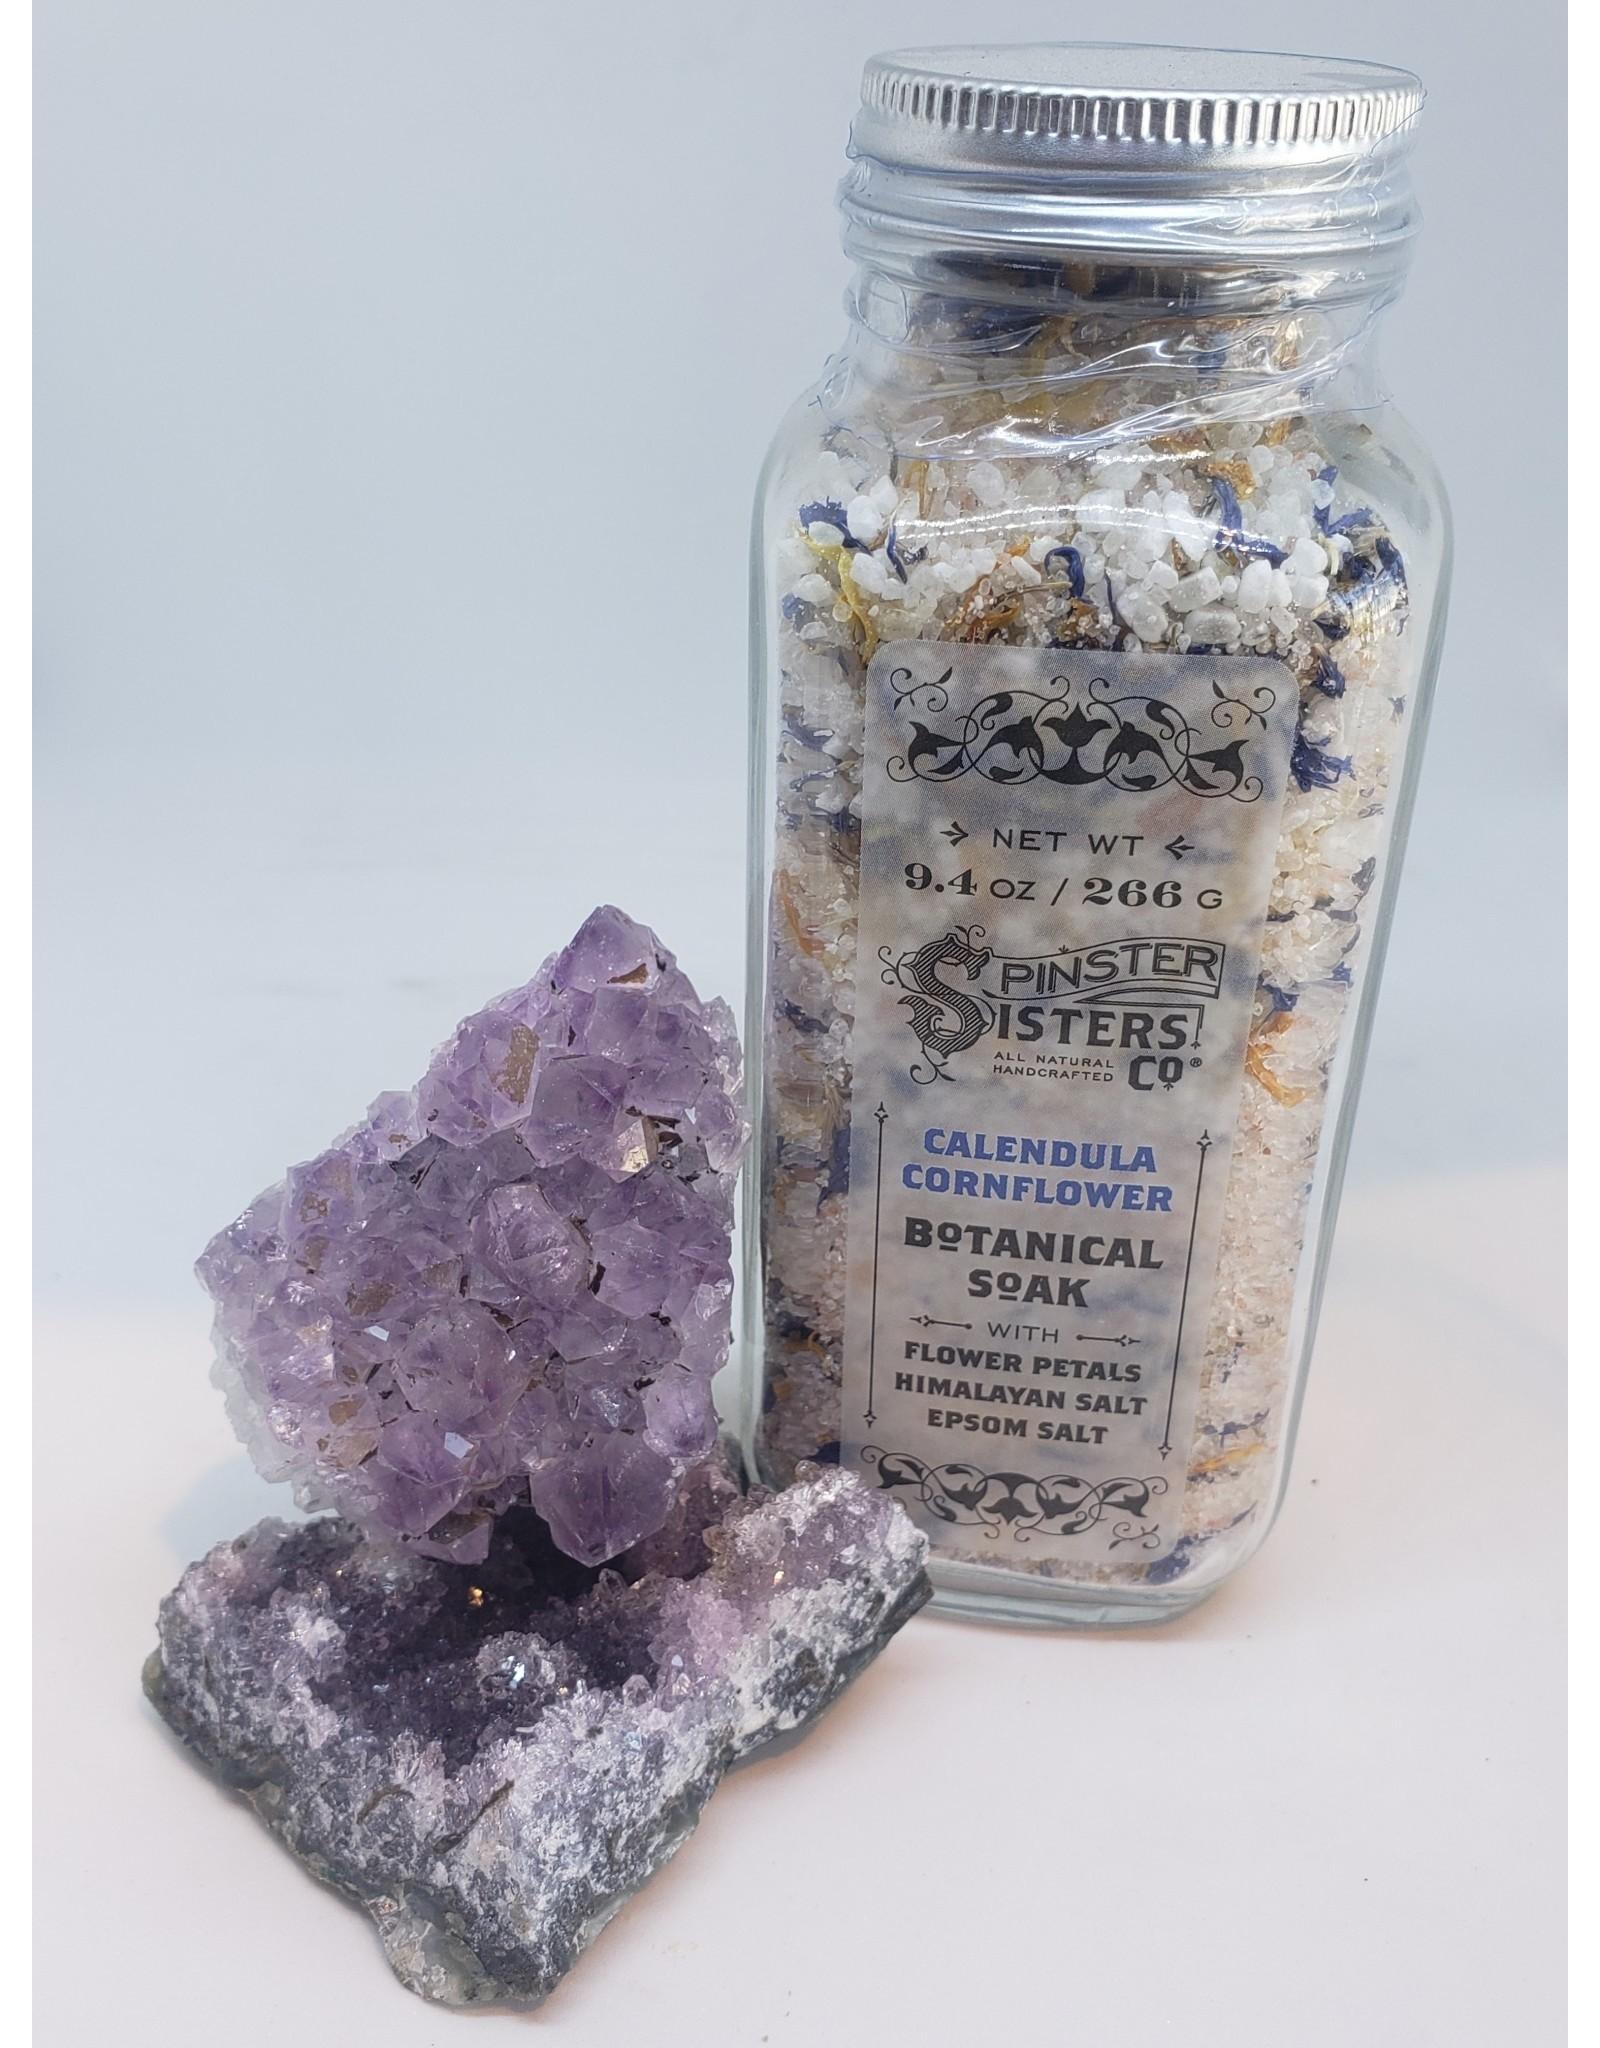 Spinster Sisters Co. Botanical Soak 9.4 oz. Bottle | Calendula Cornflowers